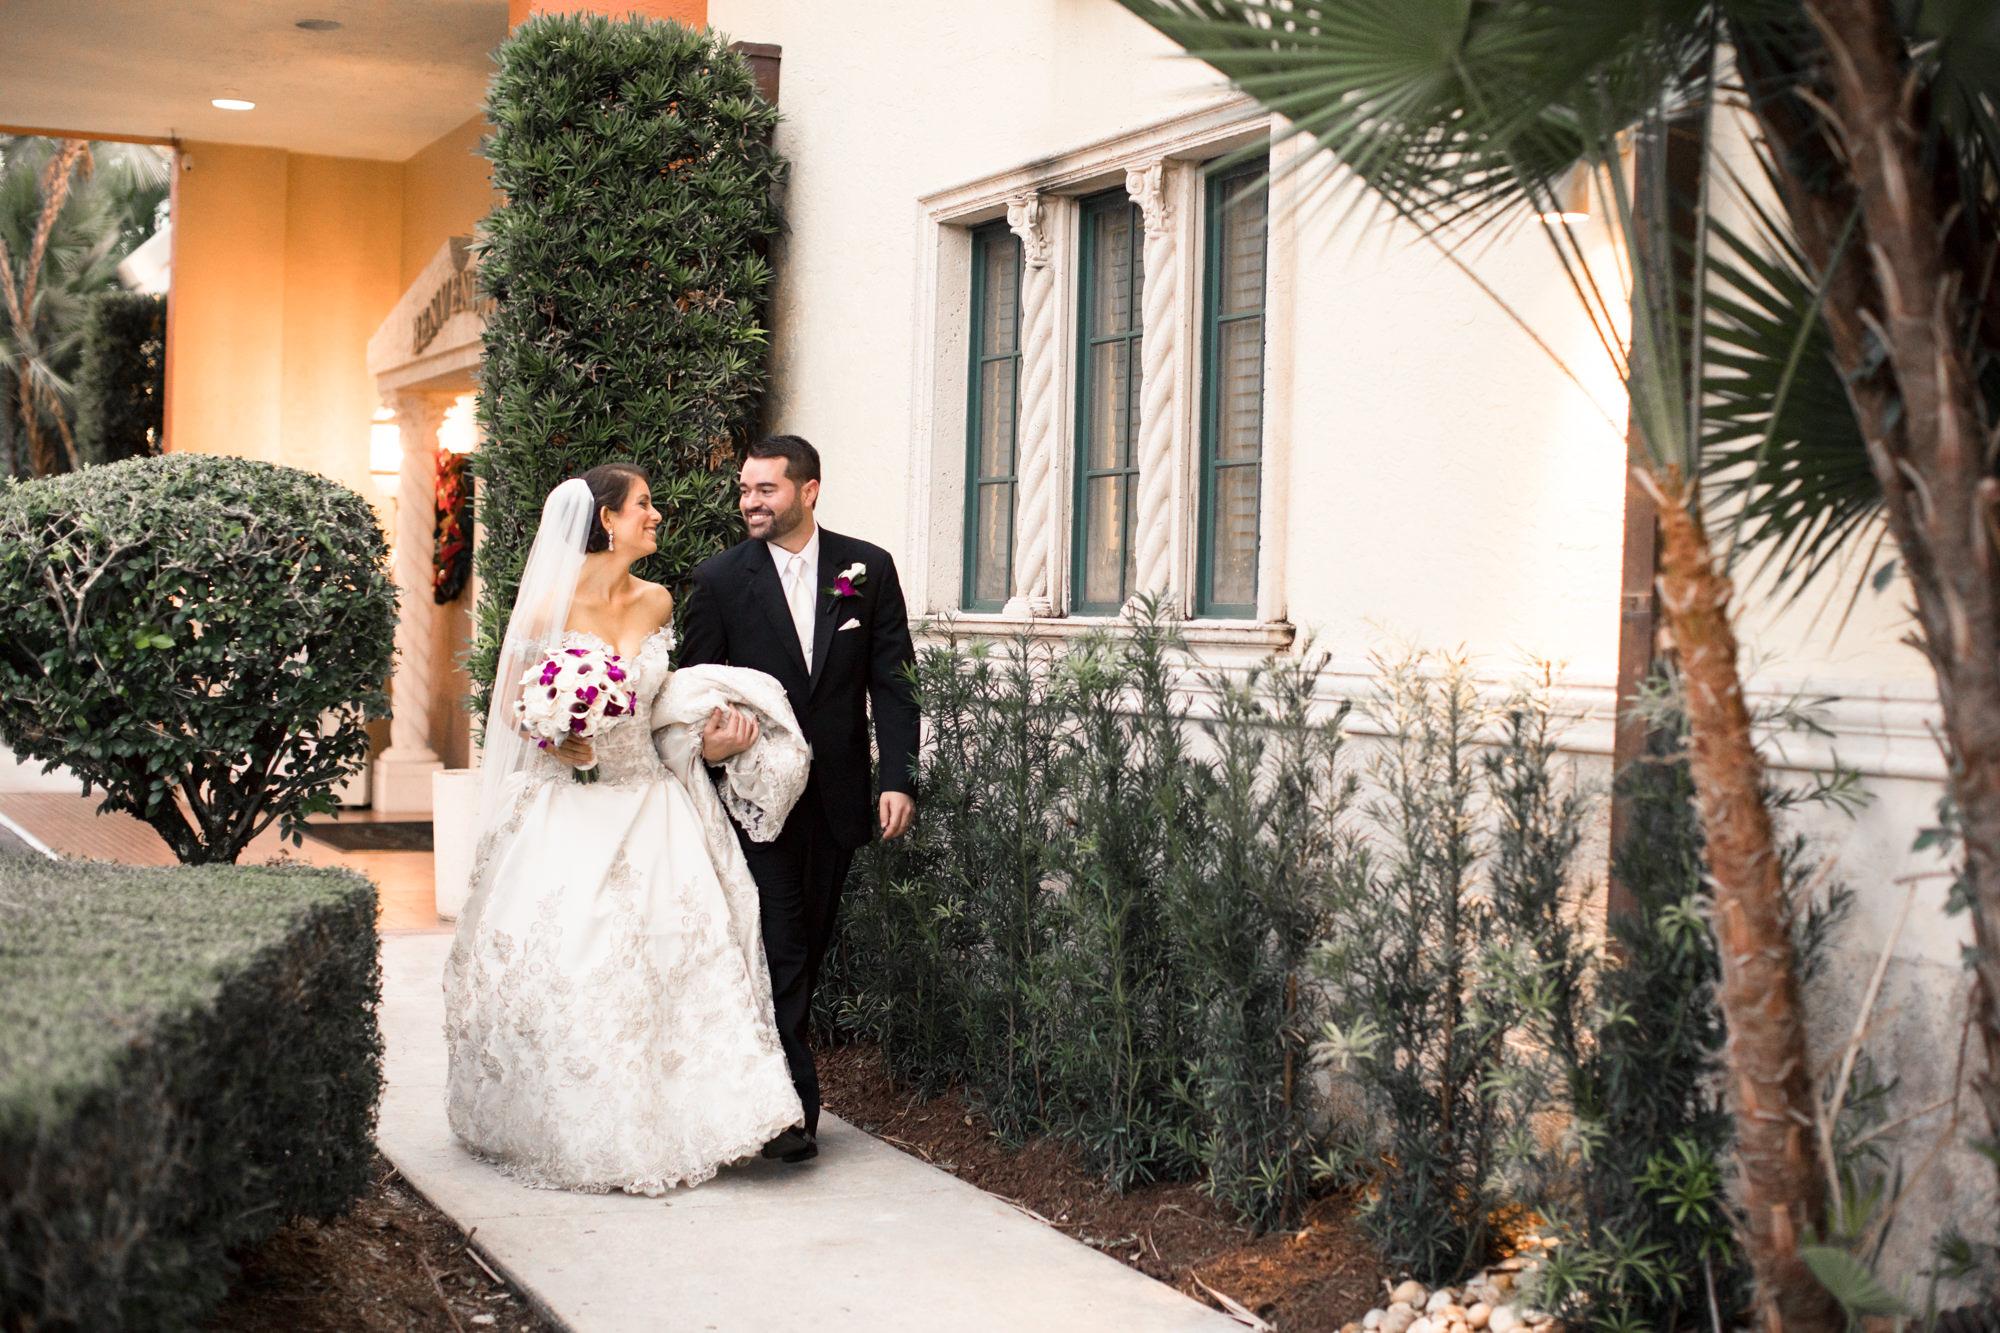 Benvenuto_Wedding_catholic_Florida_Bride-Groom-81.jpg